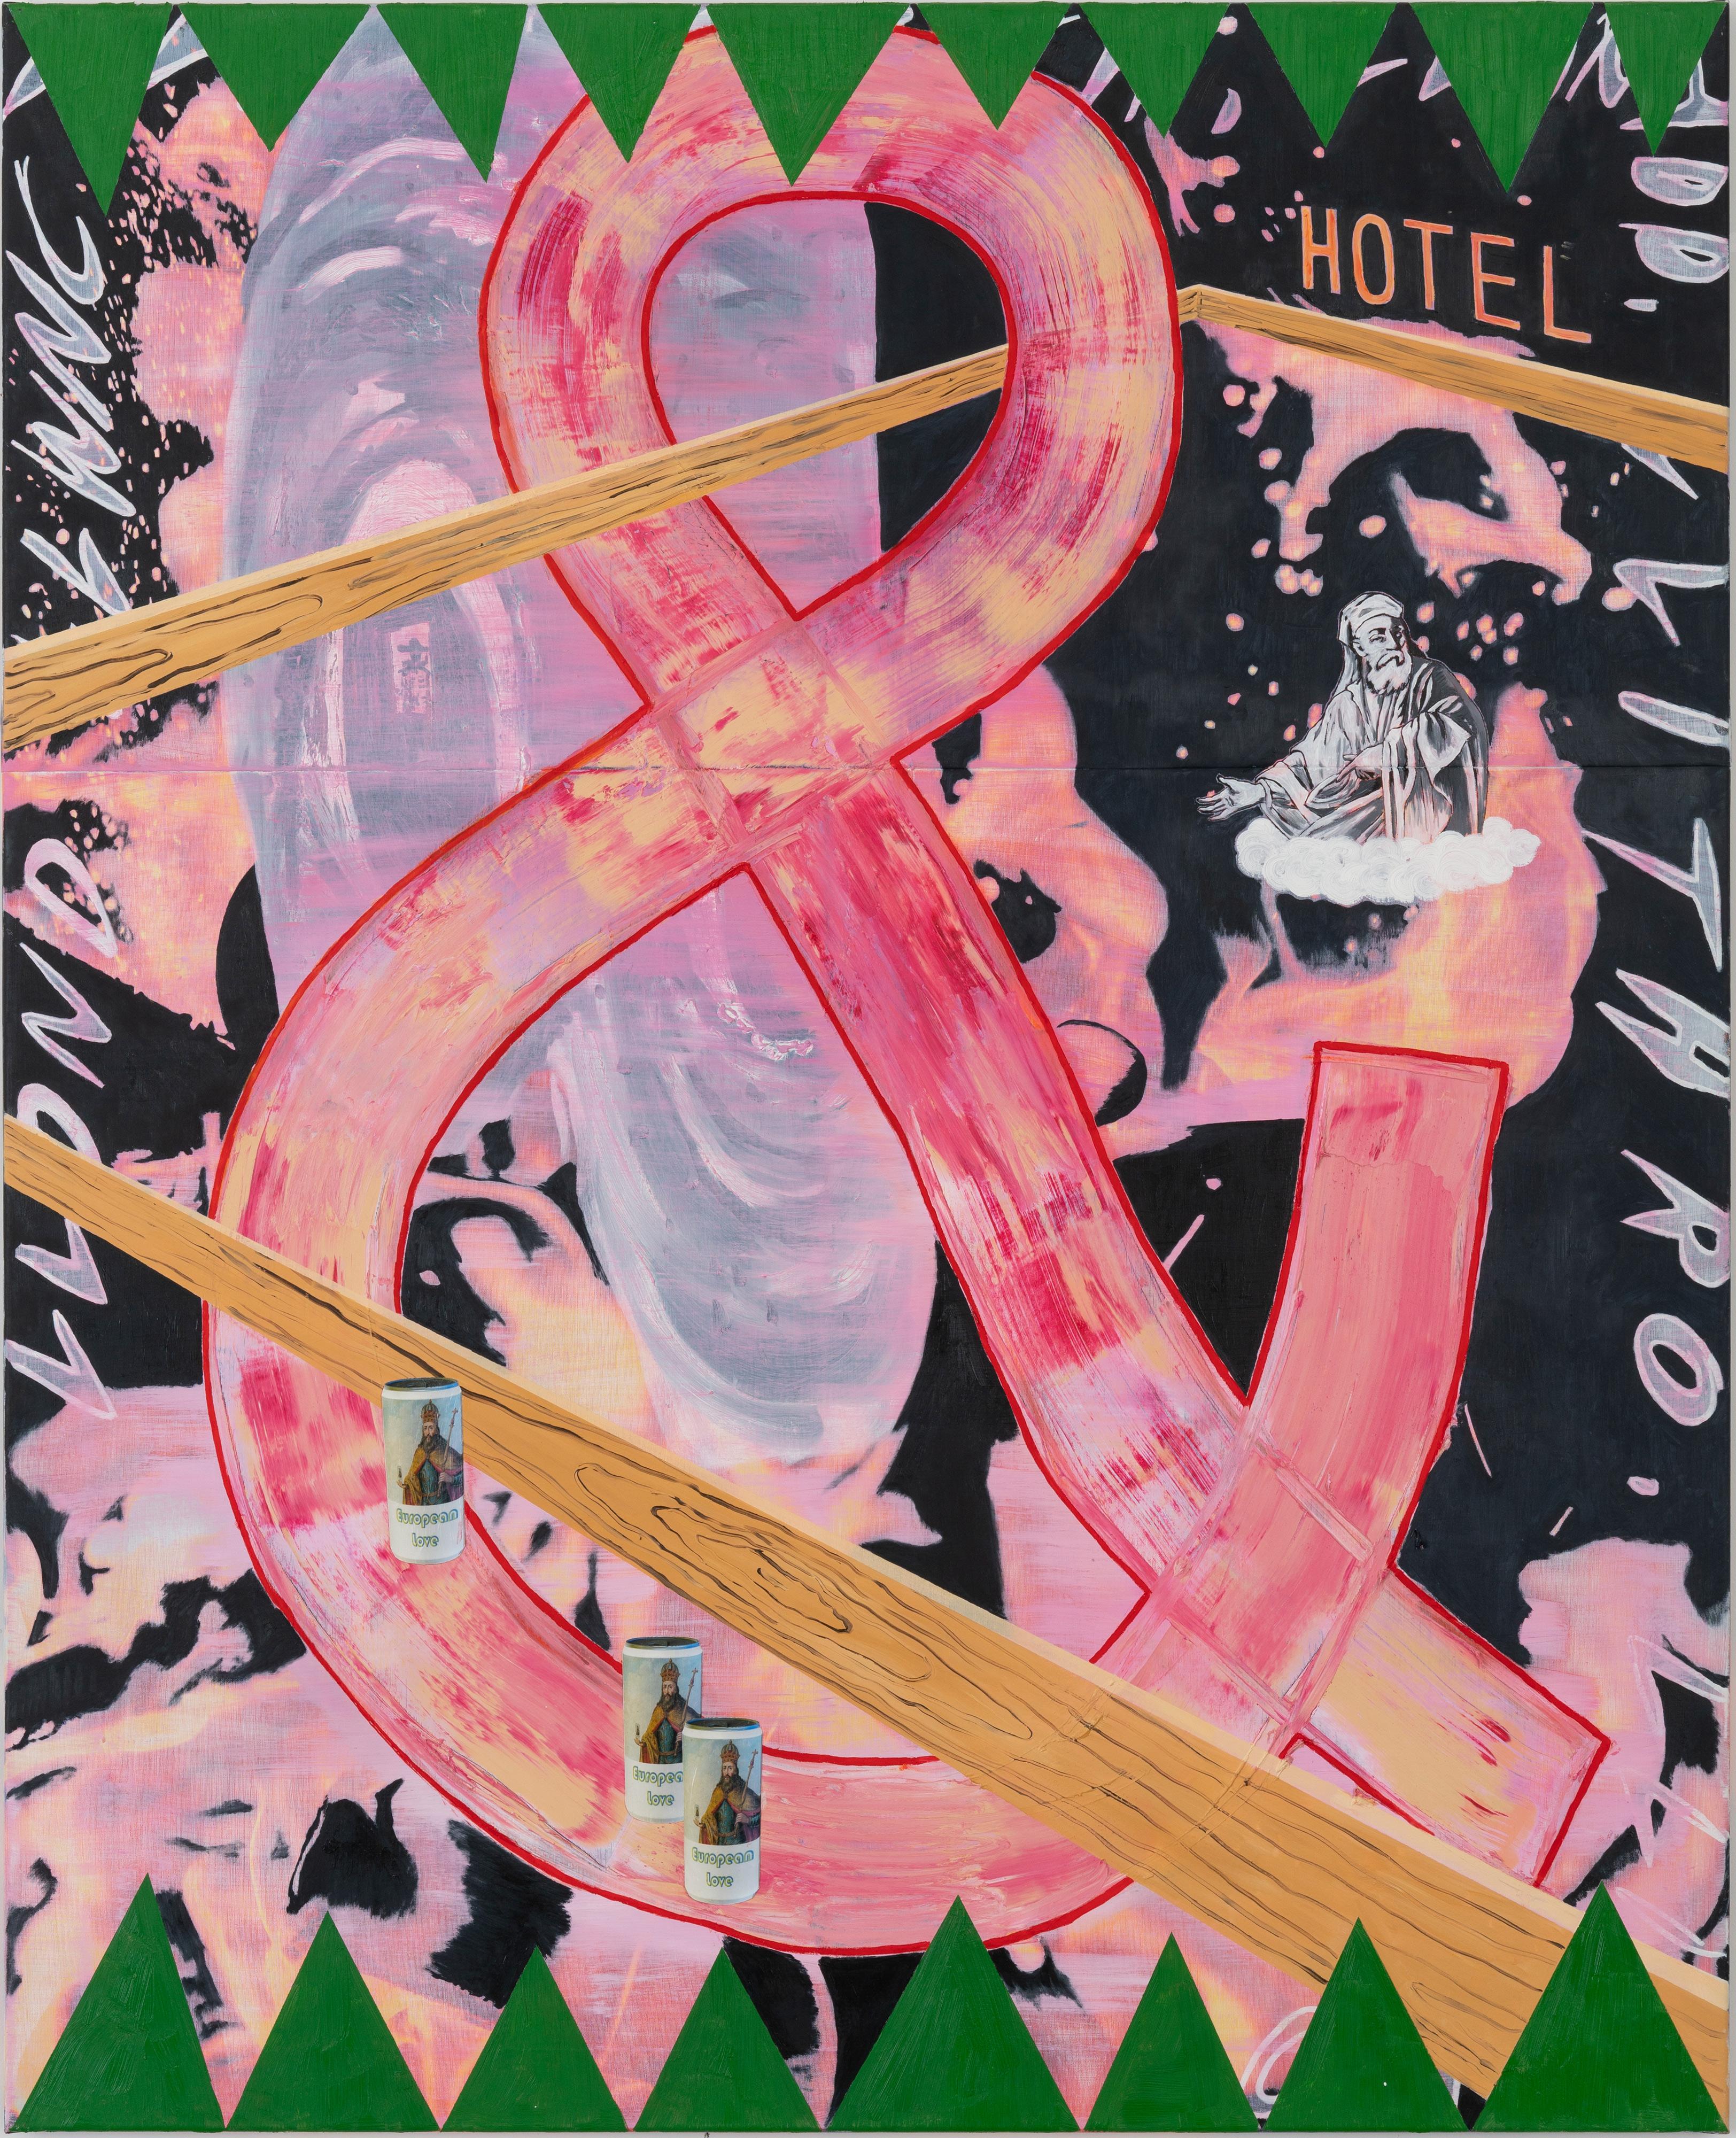 Galerie Barbara Thumm \ New Viewings #8 \ Jack Burton